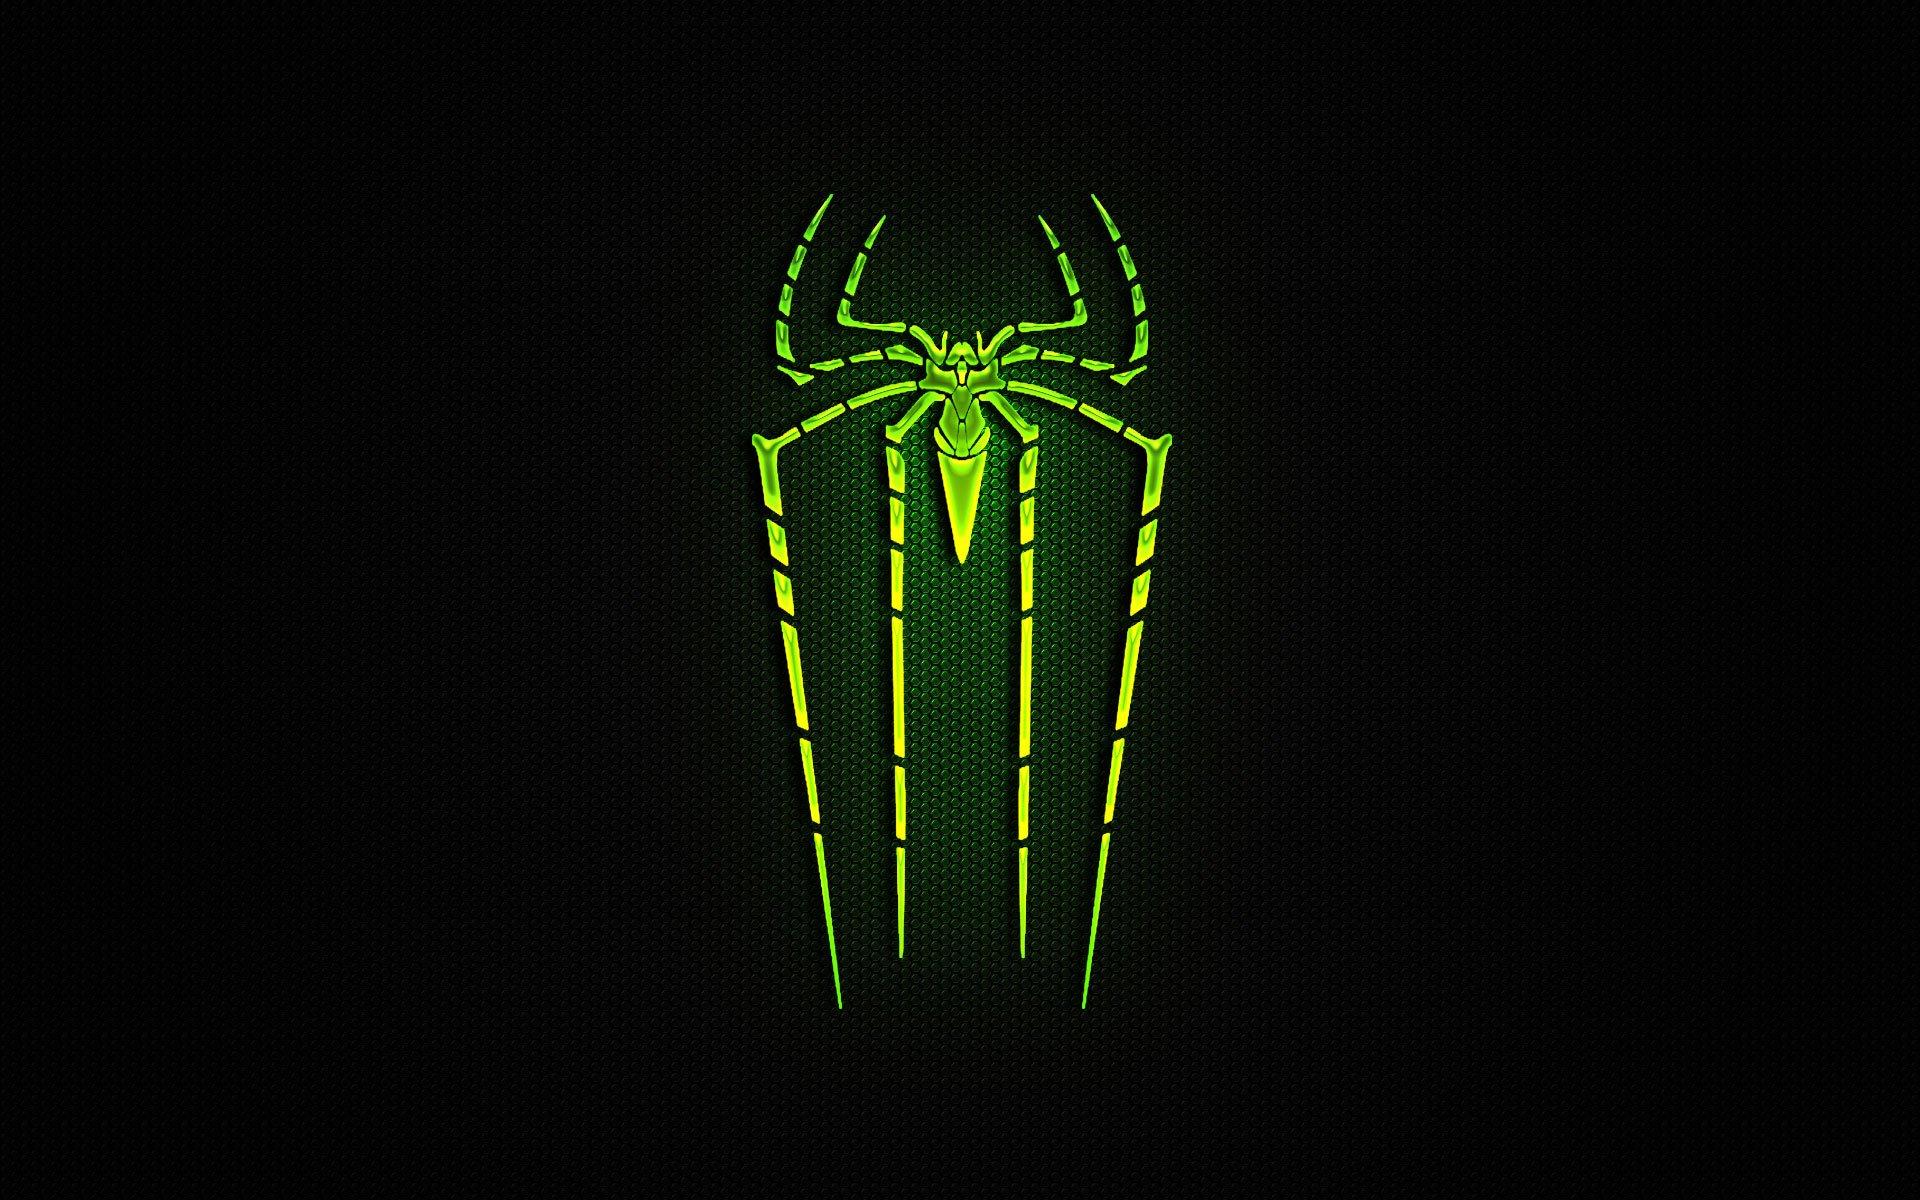 Hd wallpaper logo - Spiderman Logo Hd Pc Wallpapers 260 Hd Wallpapers Site